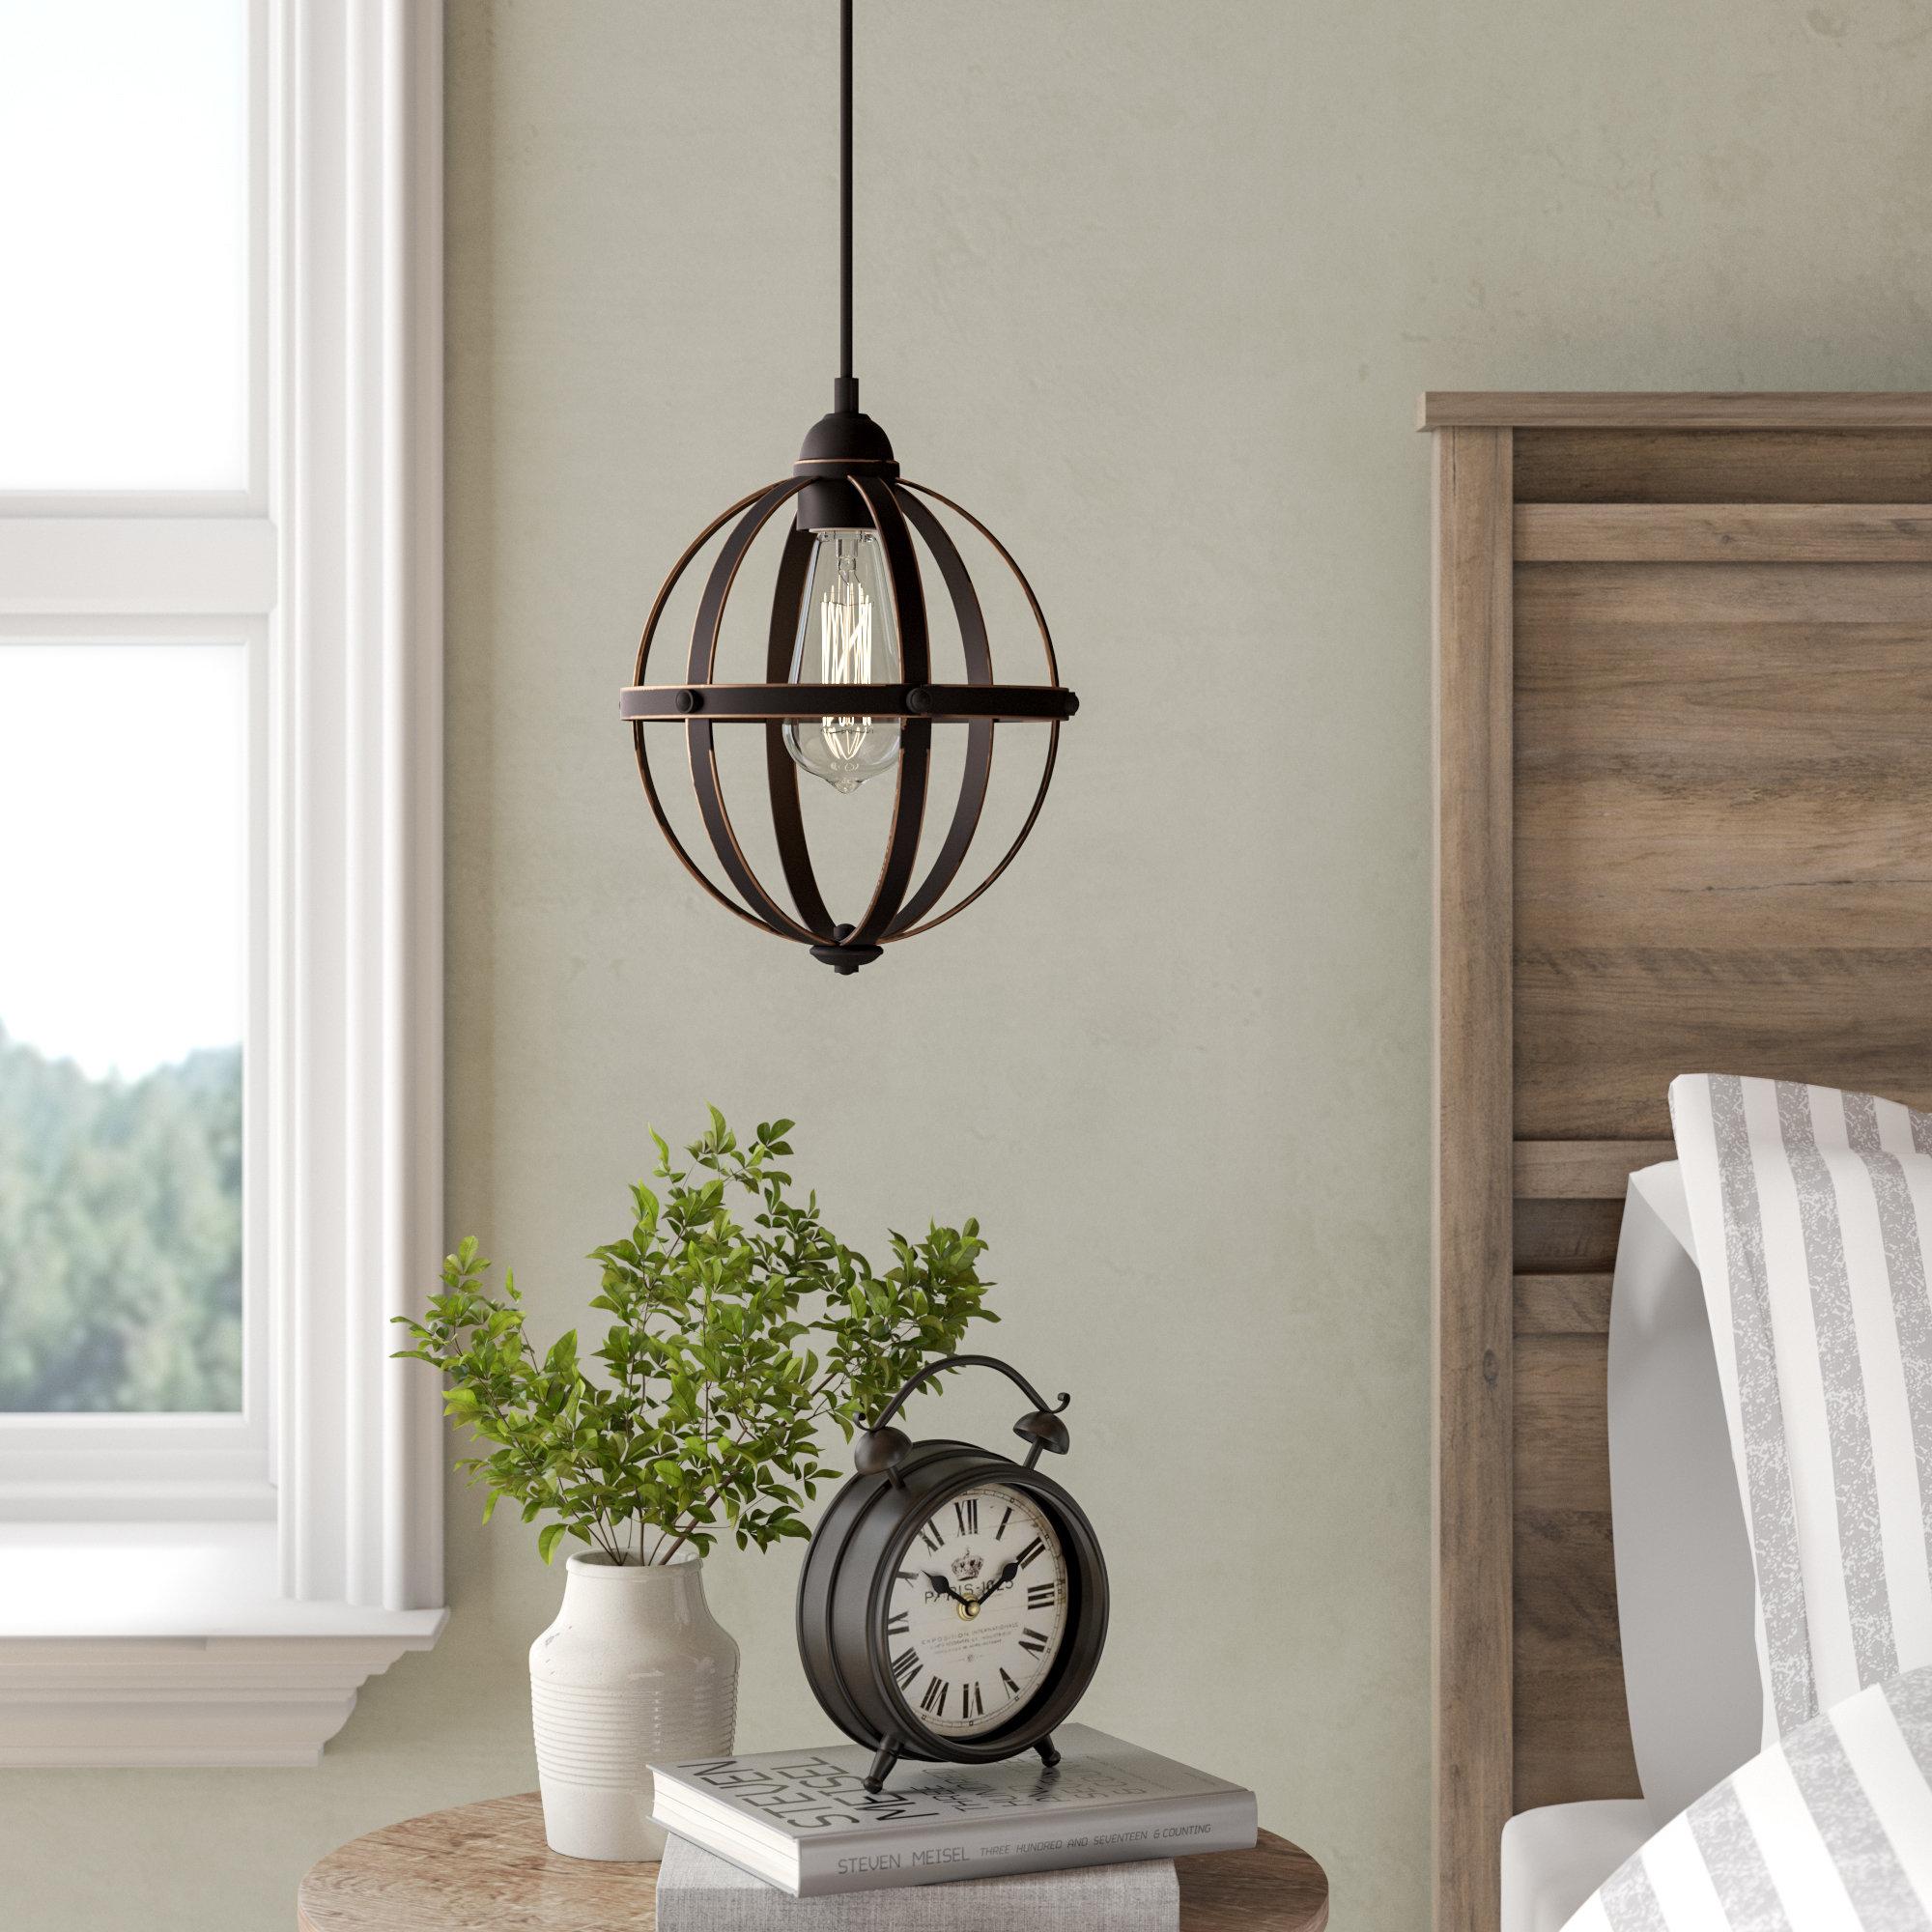 Genna 1 Light Single Globe Pendant Regarding Irwin 1 Light Single Globe Pendants (View 12 of 30)